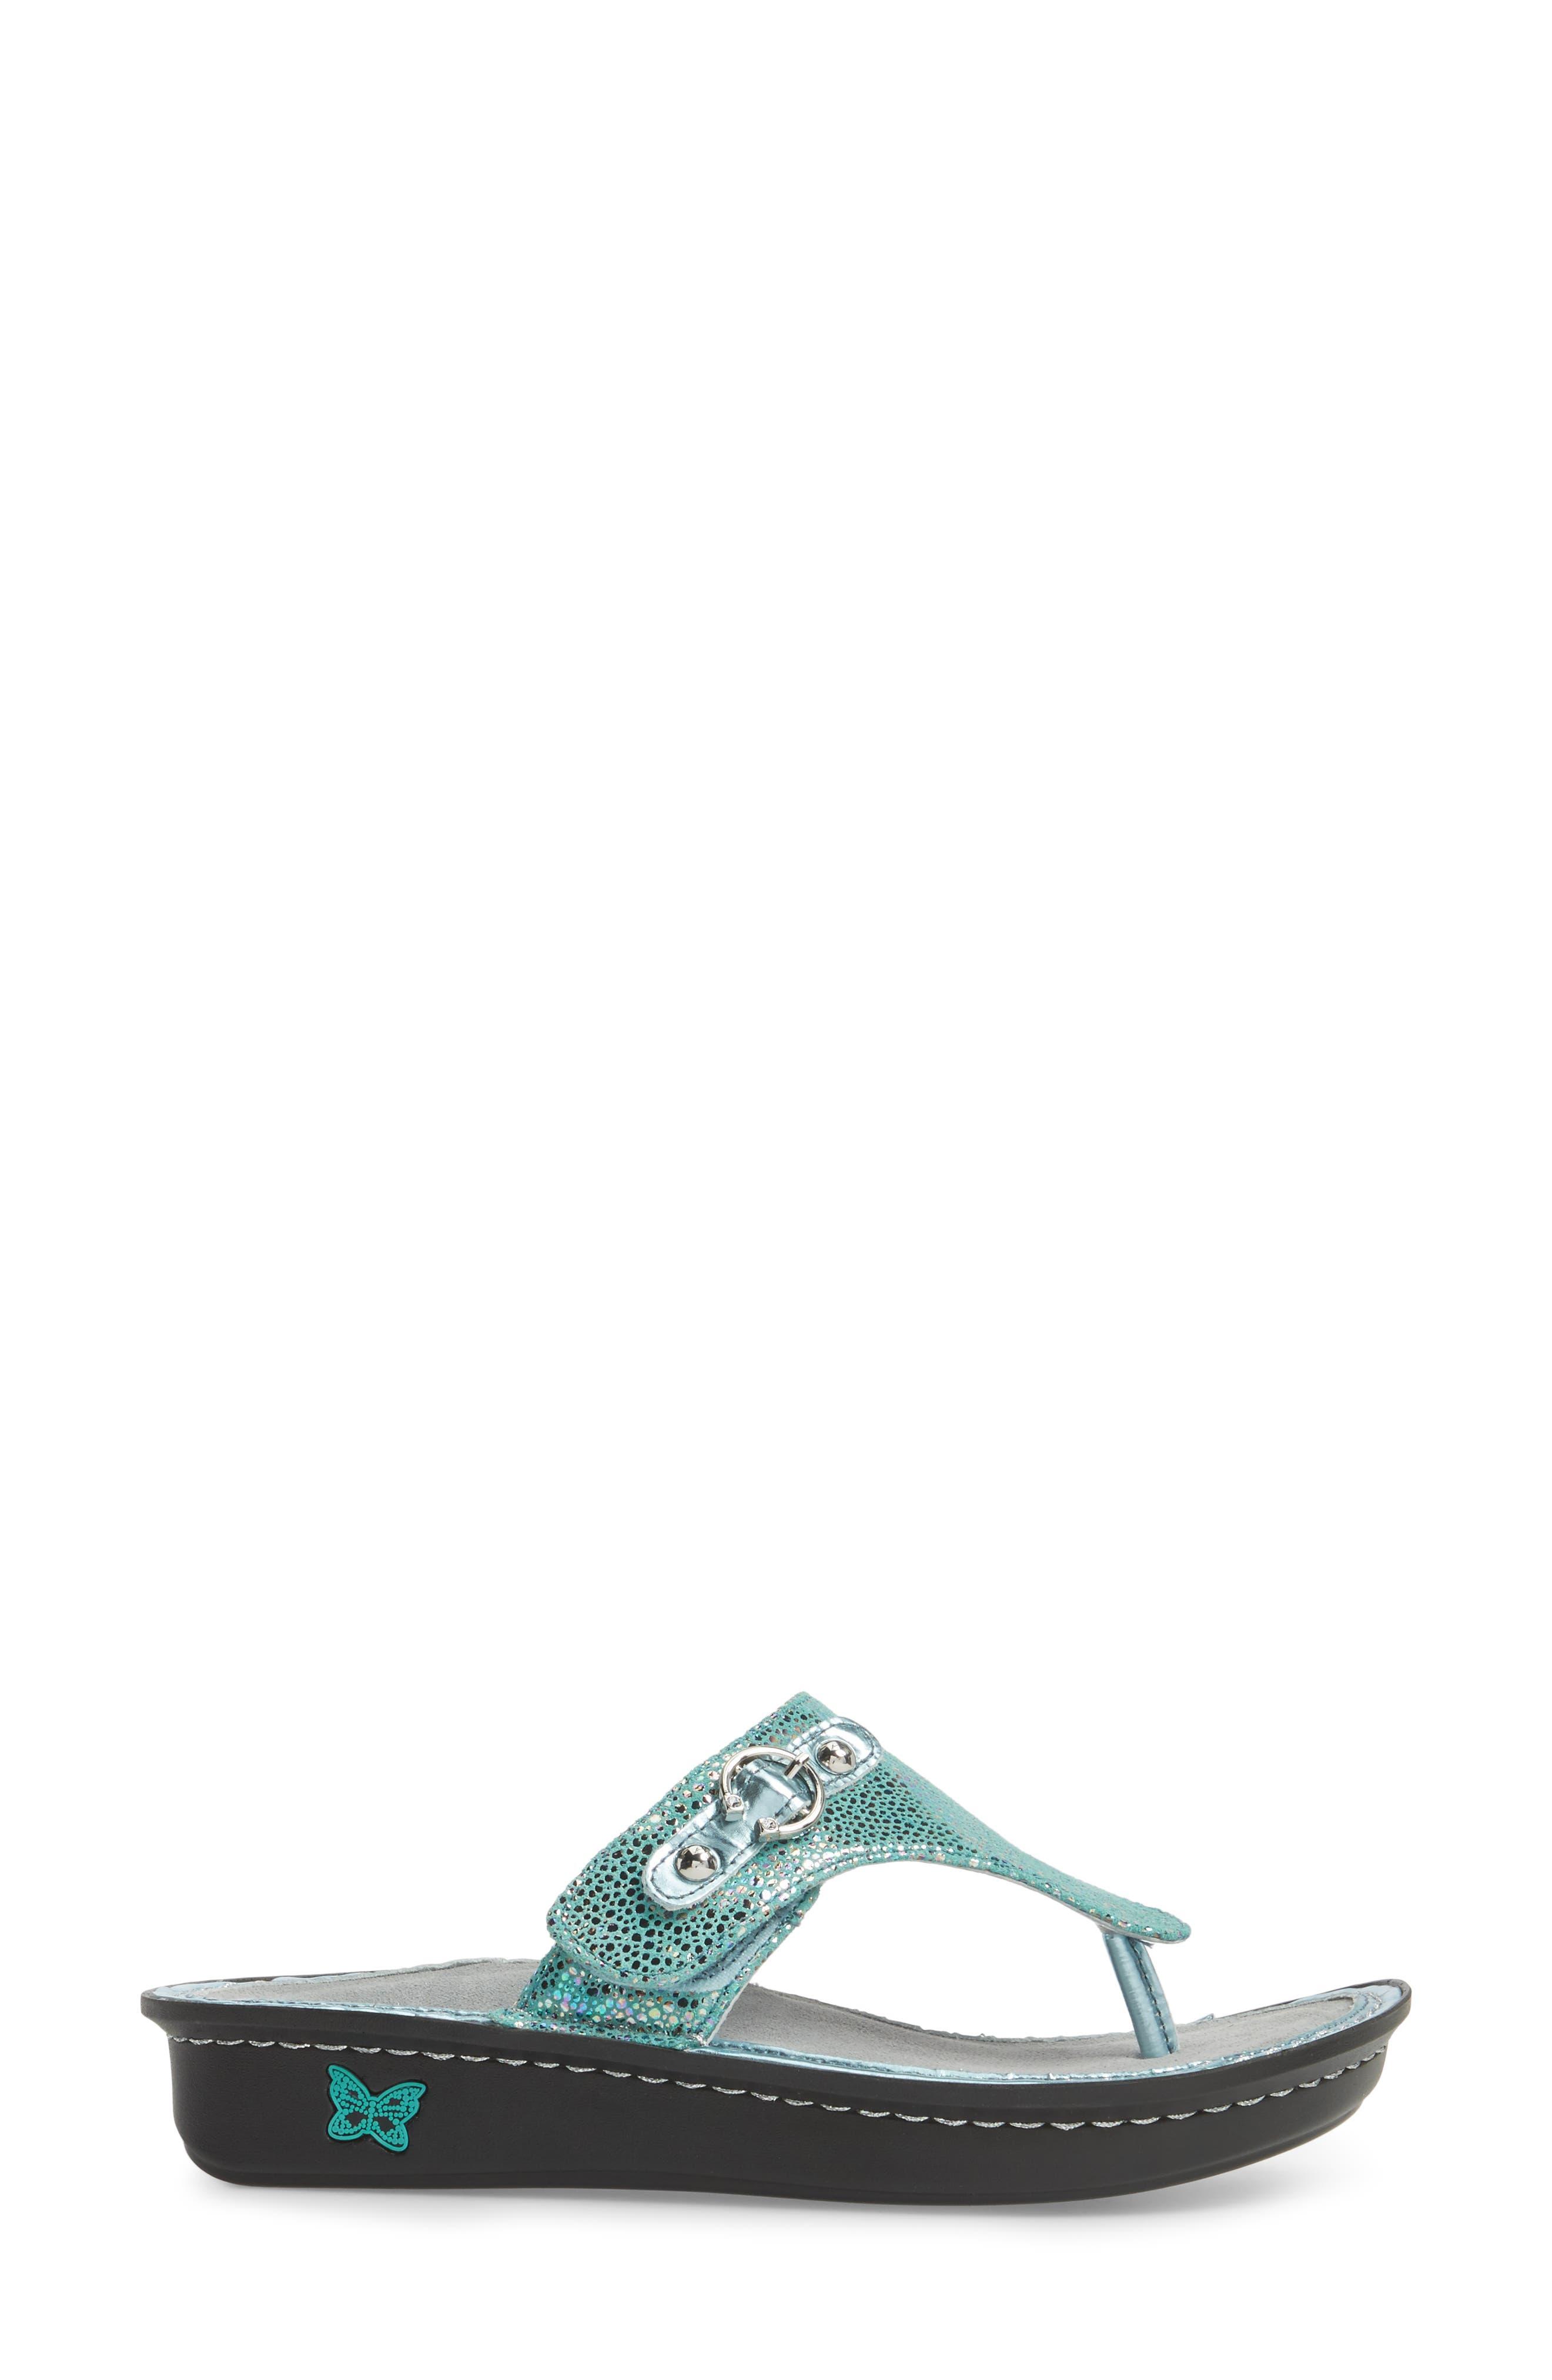 'Vanessa' Thong Sandal,                             Alternate thumbnail 3, color,                             Aqua Love Leather